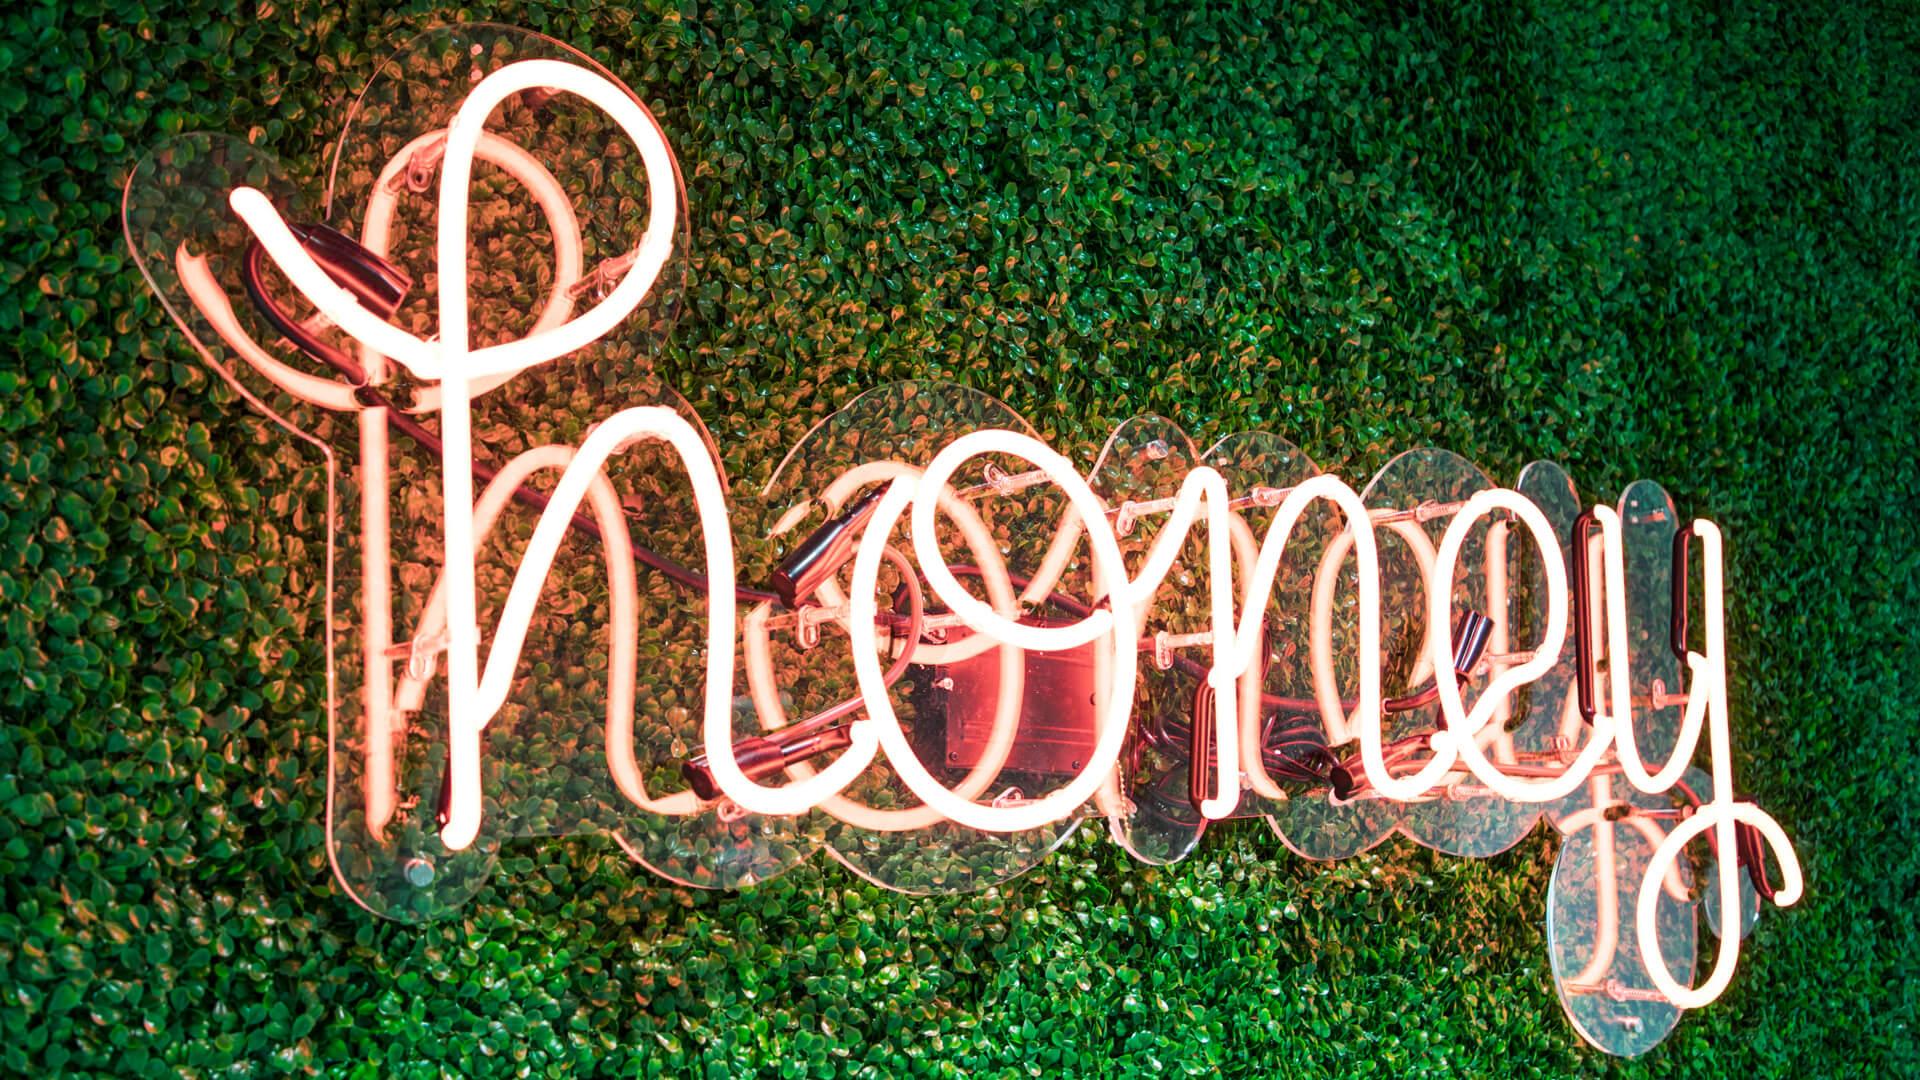 Honey neon sign